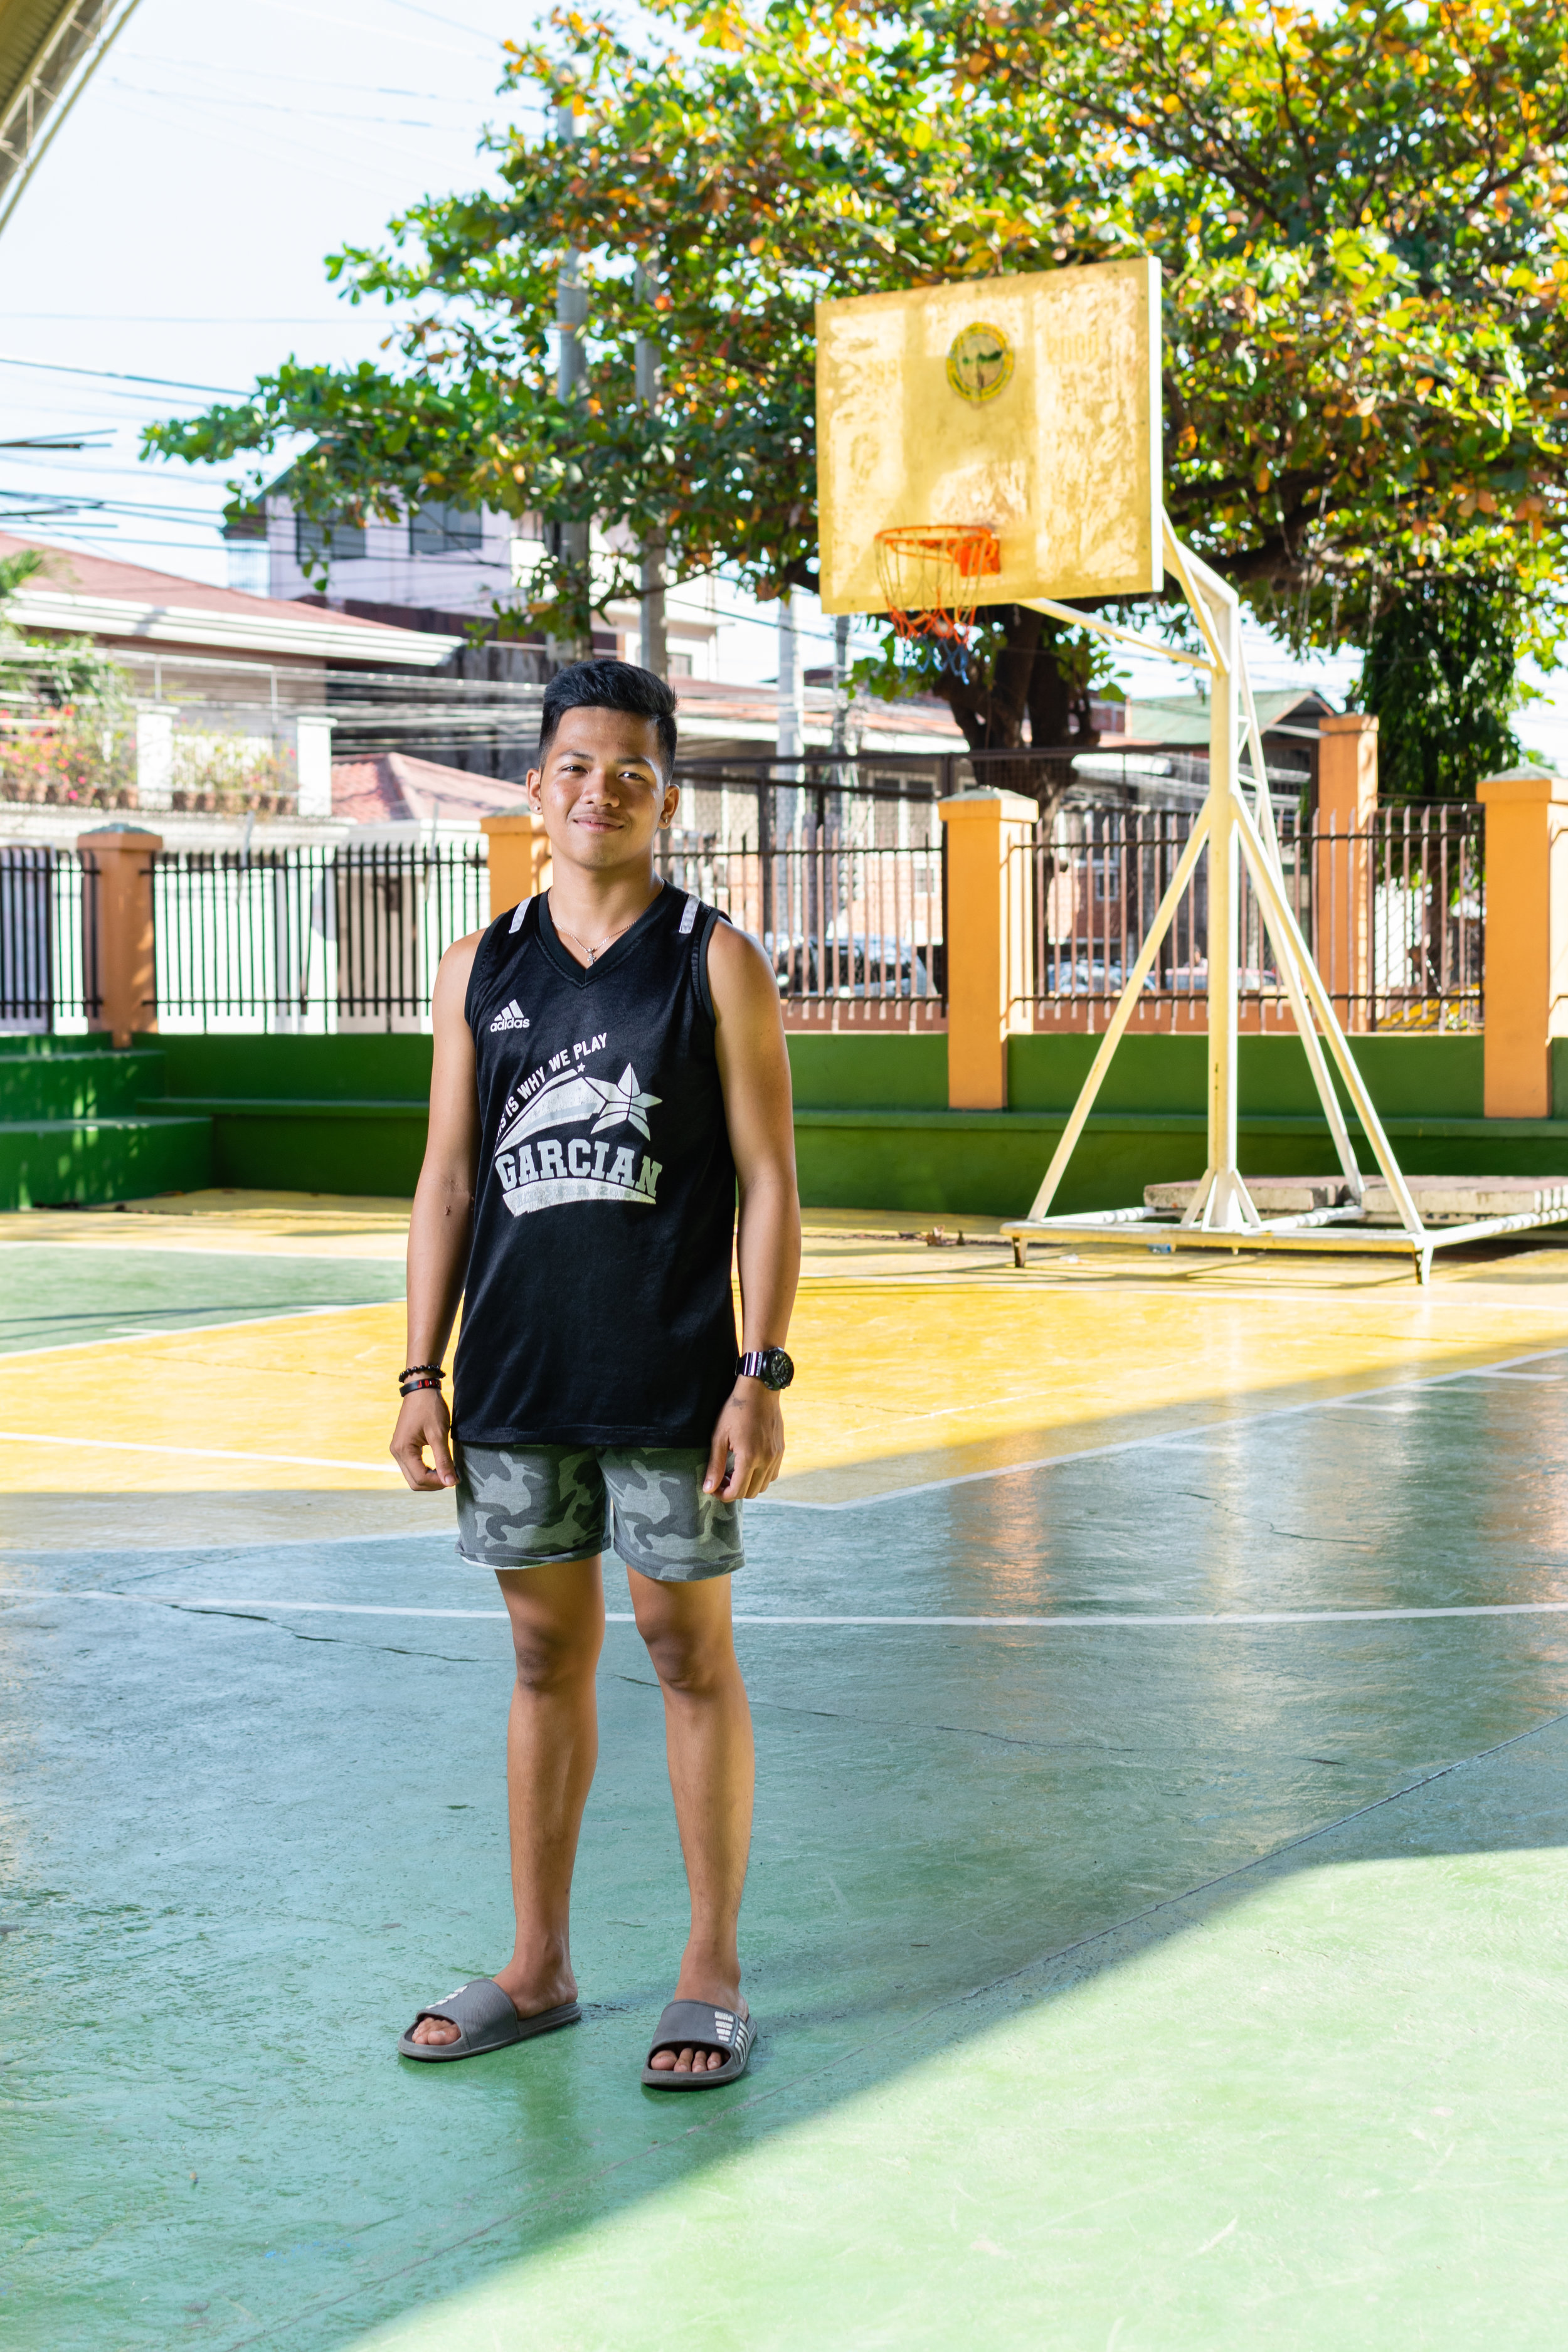 190303_basketball_portrait-5.jpg